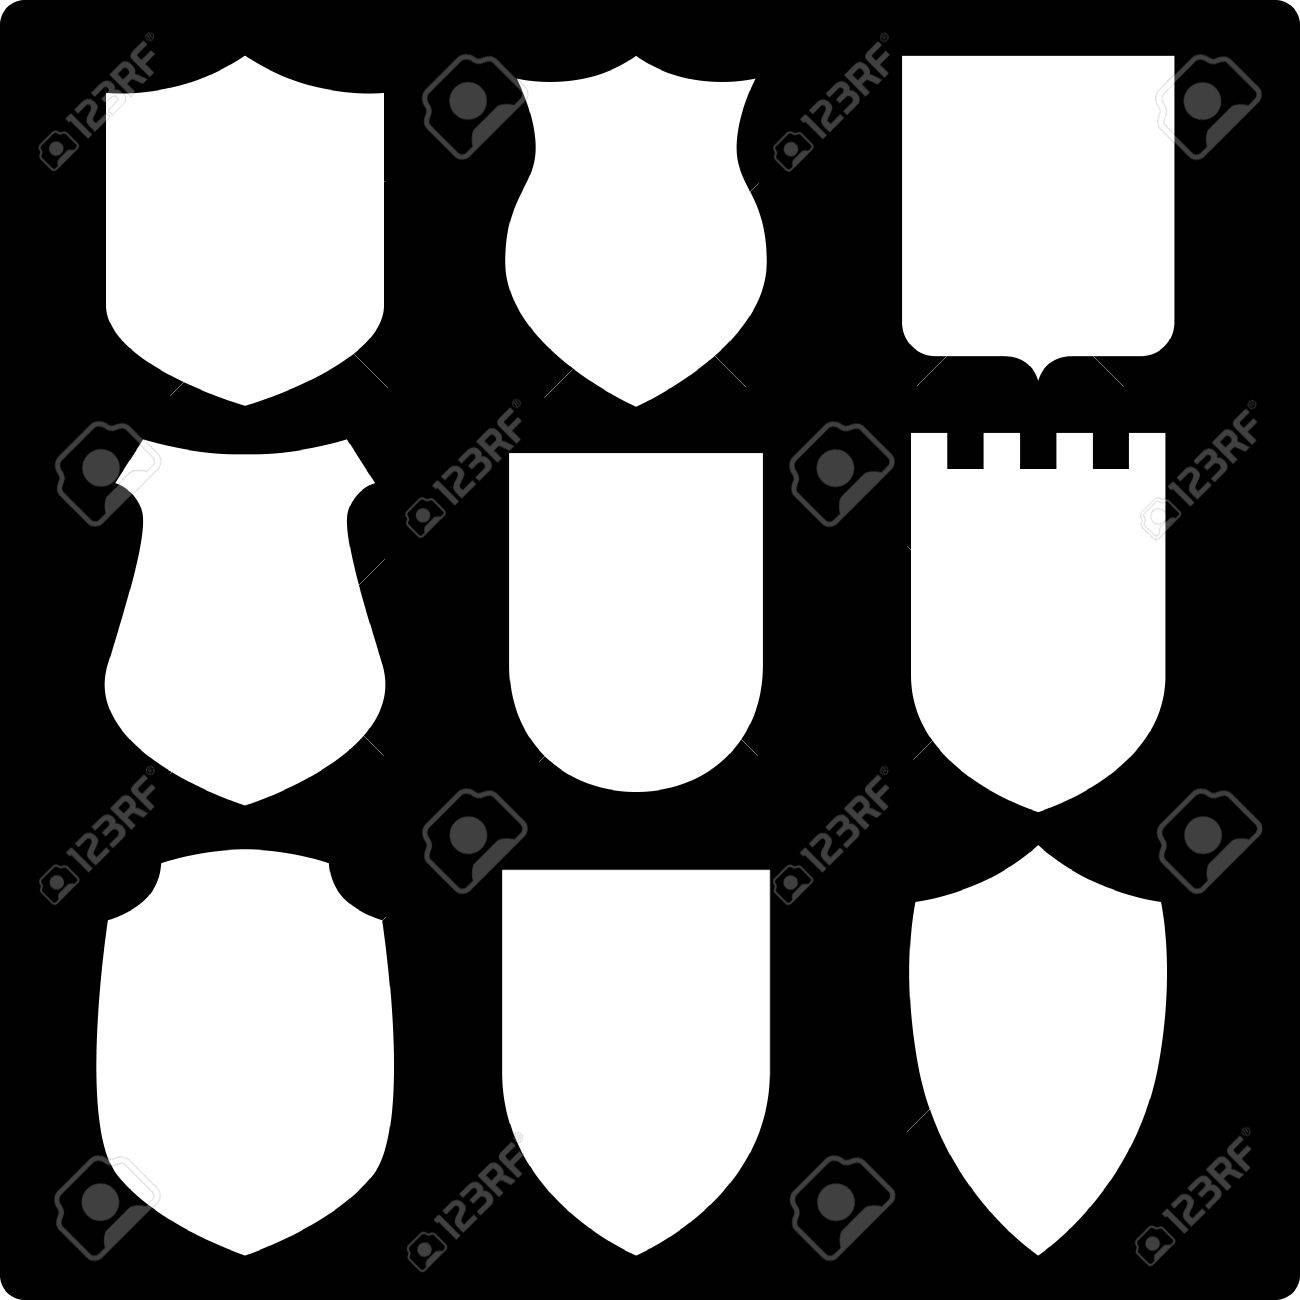 Set of various shields. Vector Illustration. Stock Vector - 4421321